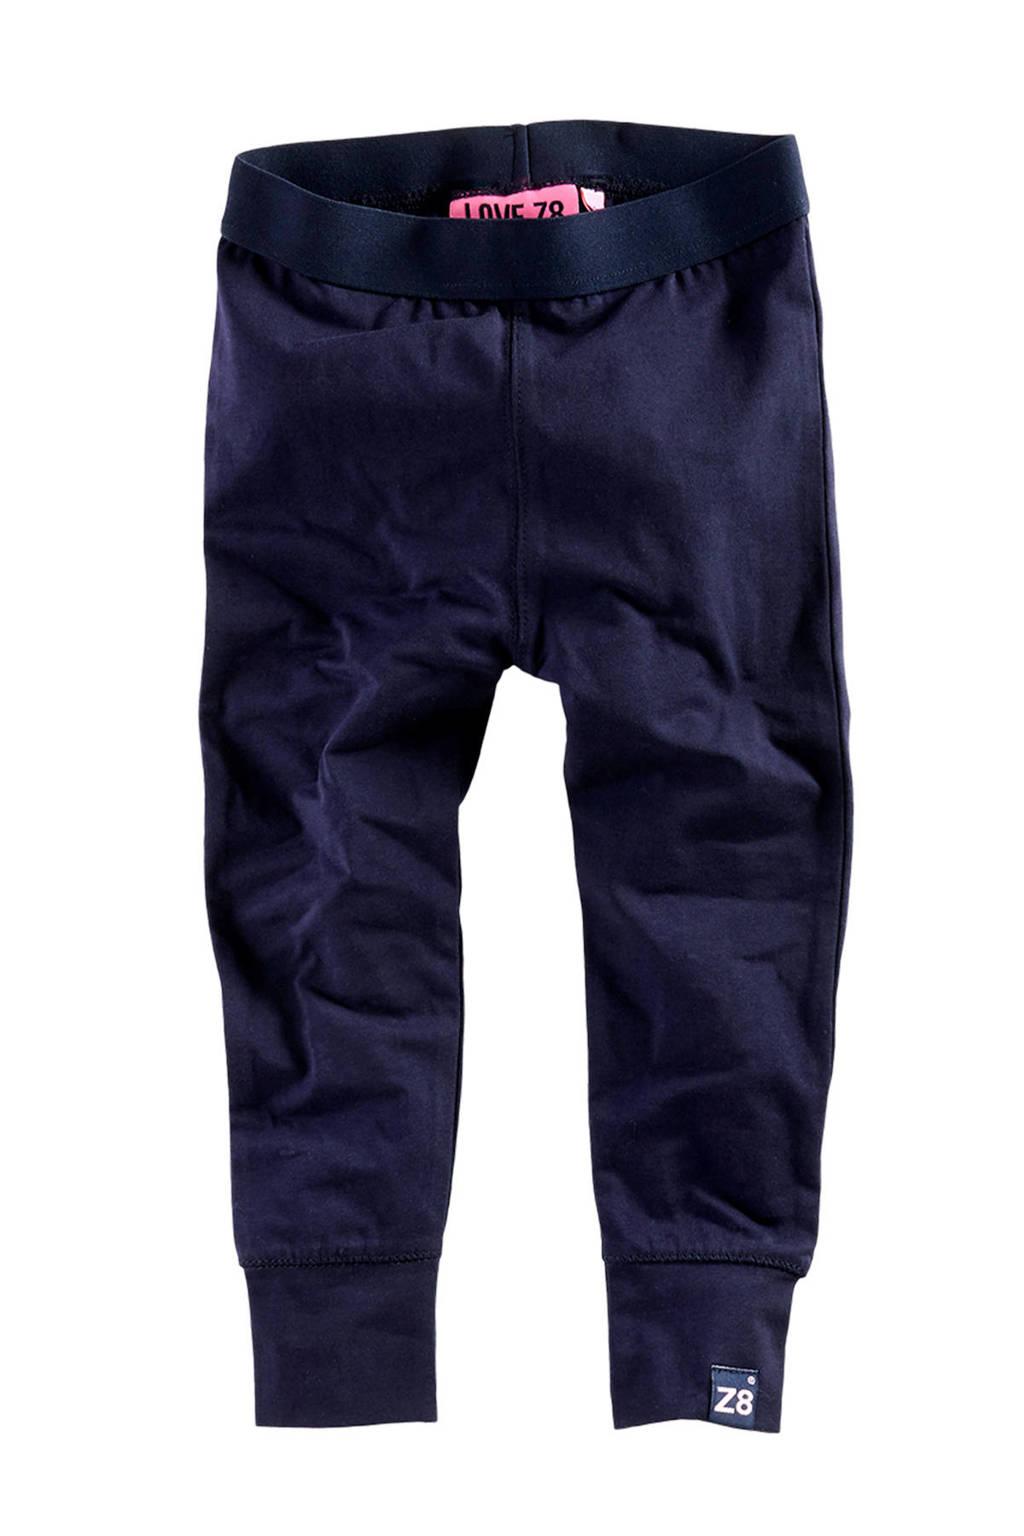 Z8 legging Mijntje blauw, Donkerblauw